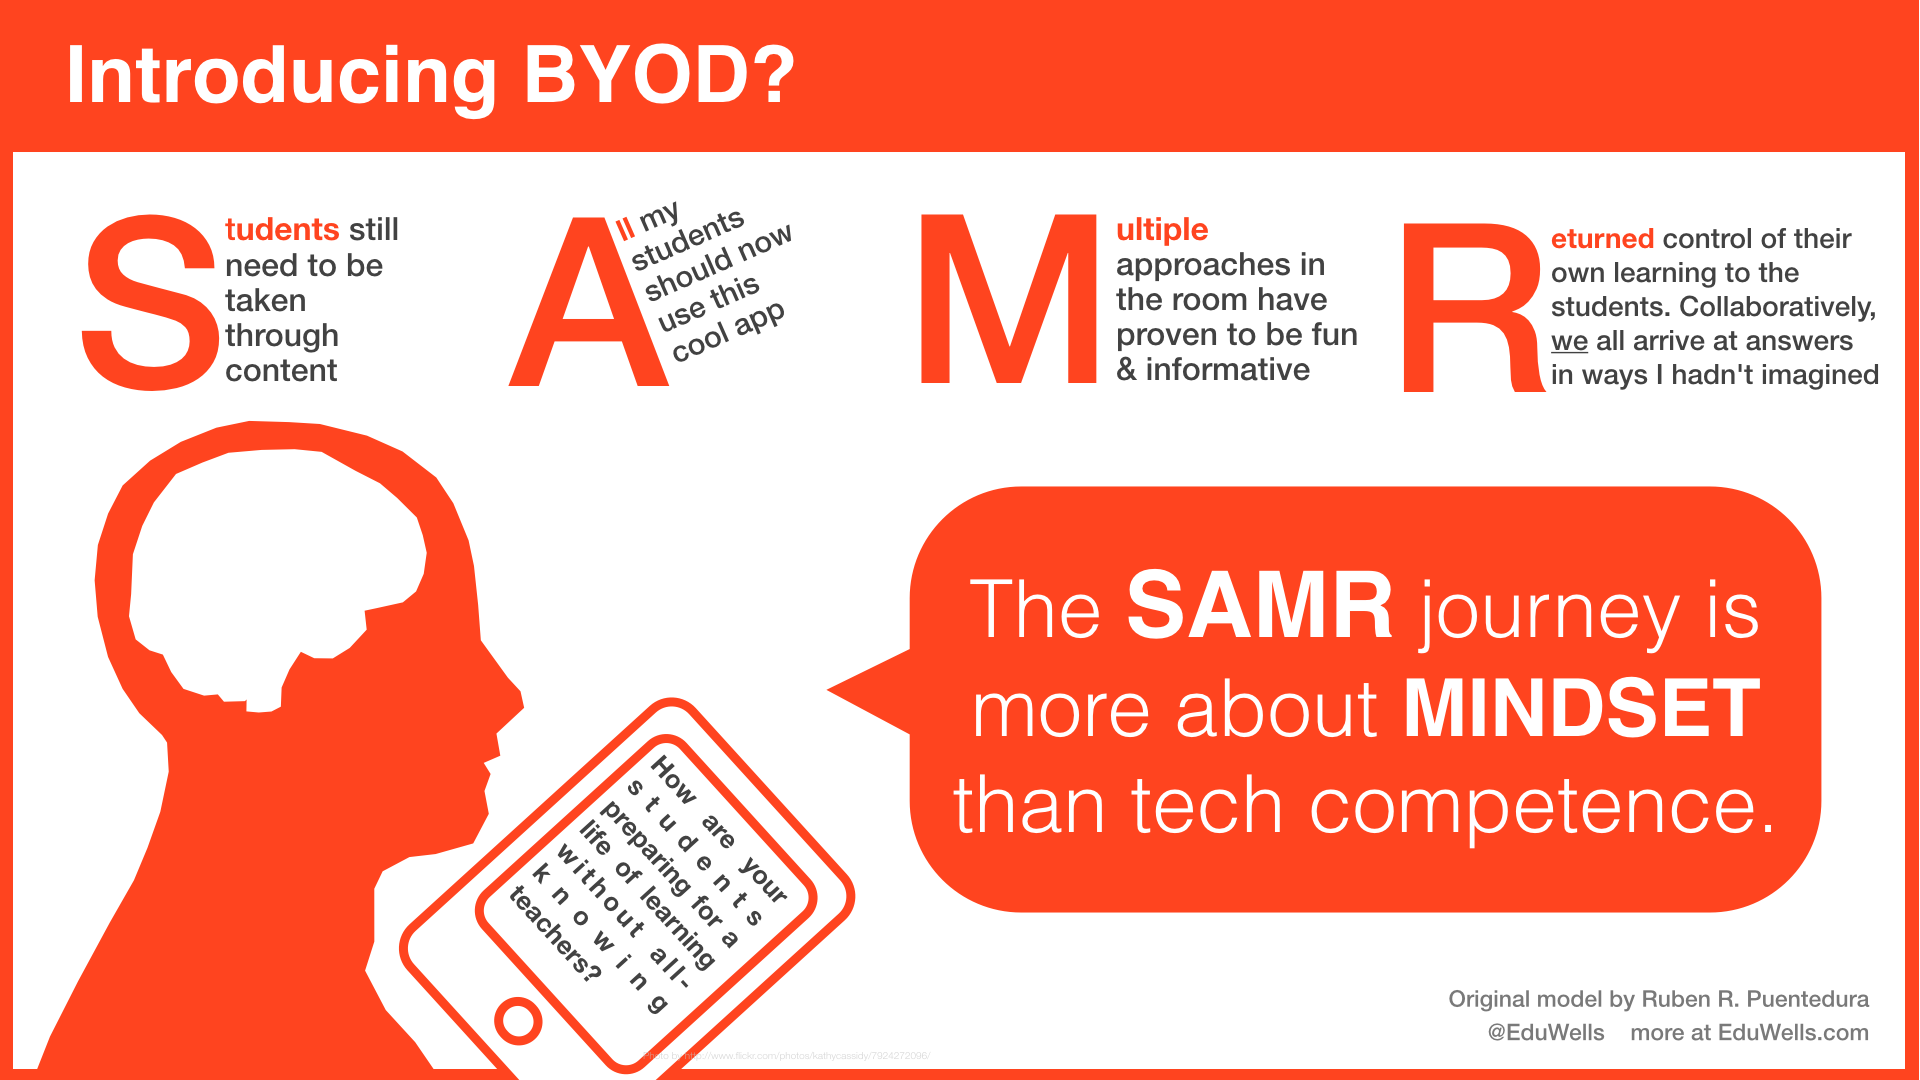 SAMR success is NOT about Tech